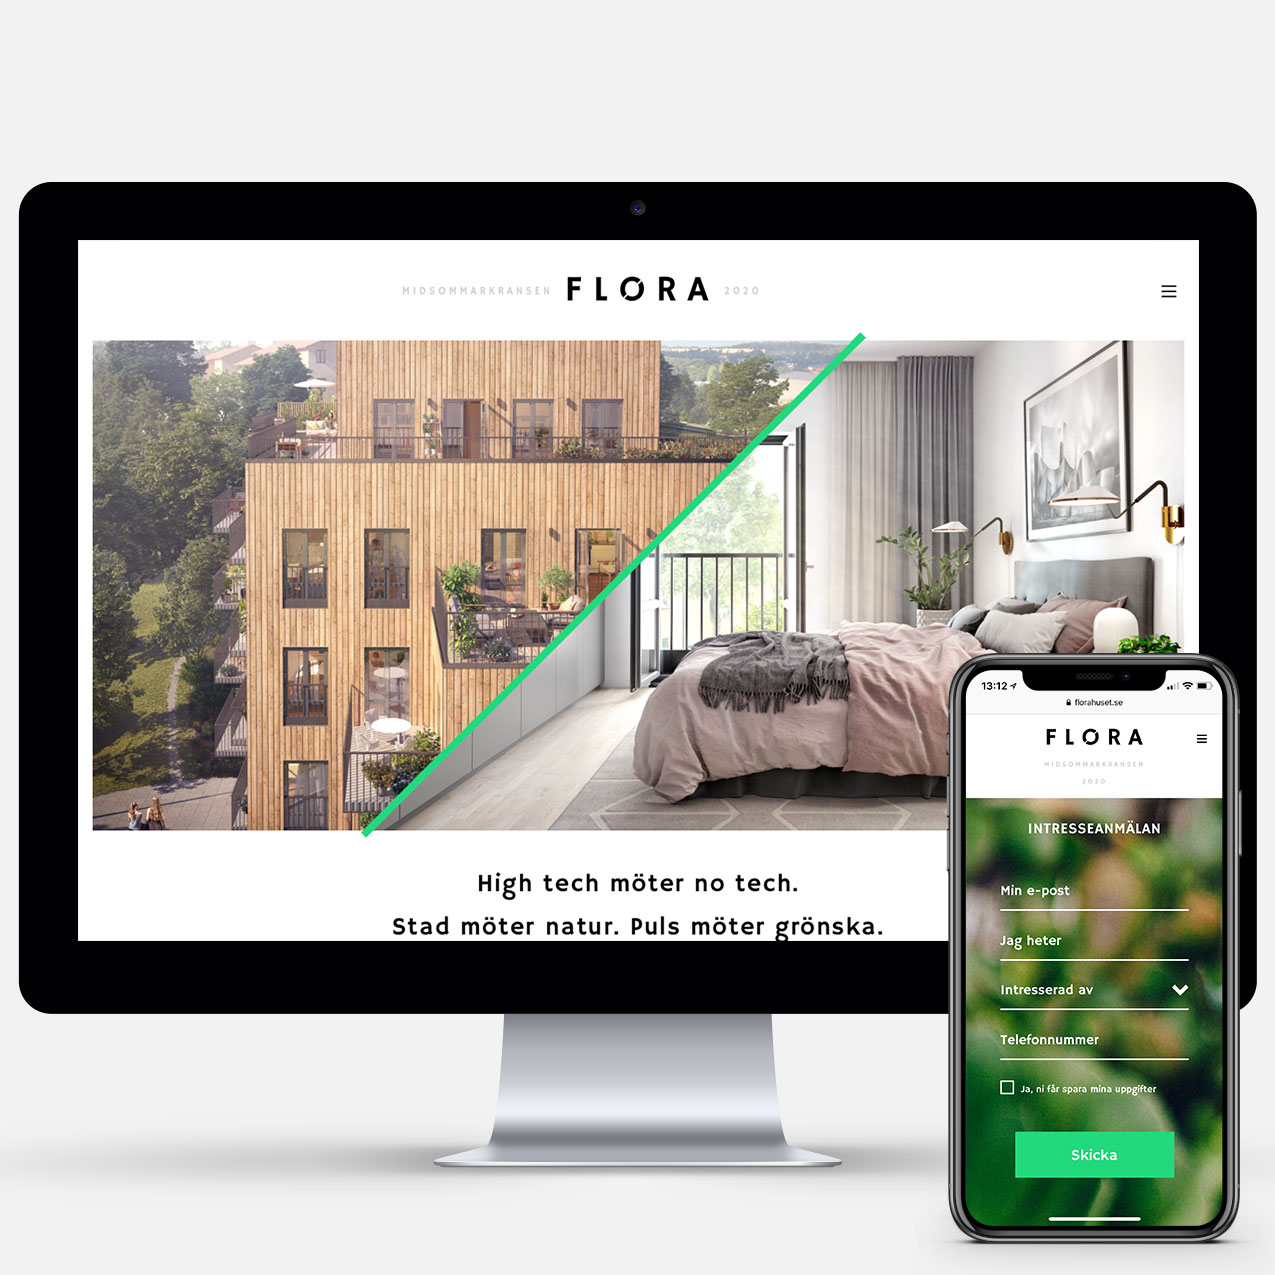 Flora webb / mobil WordPress